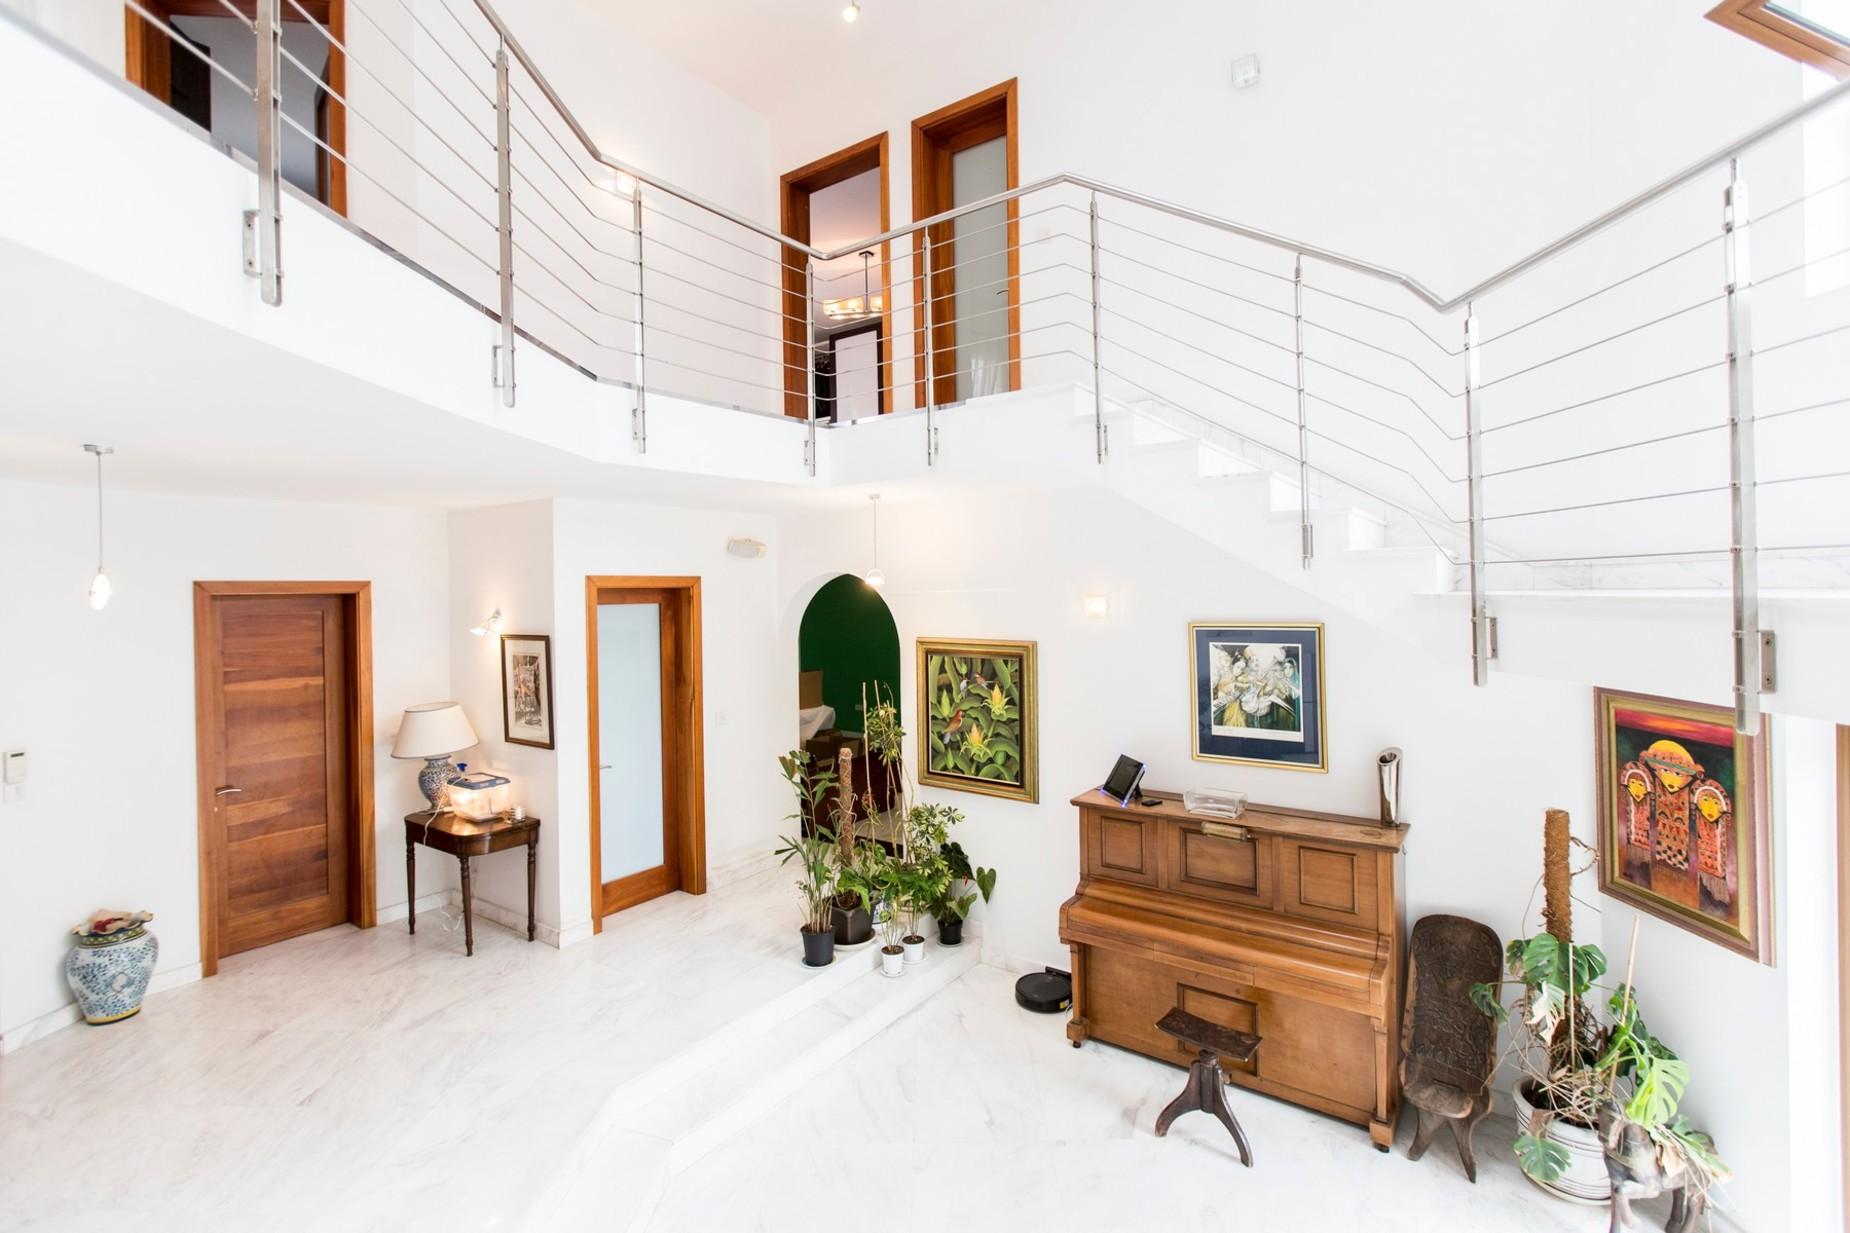 4 bed Villa For Rent in Naxxar, Naxxar - thumb 4